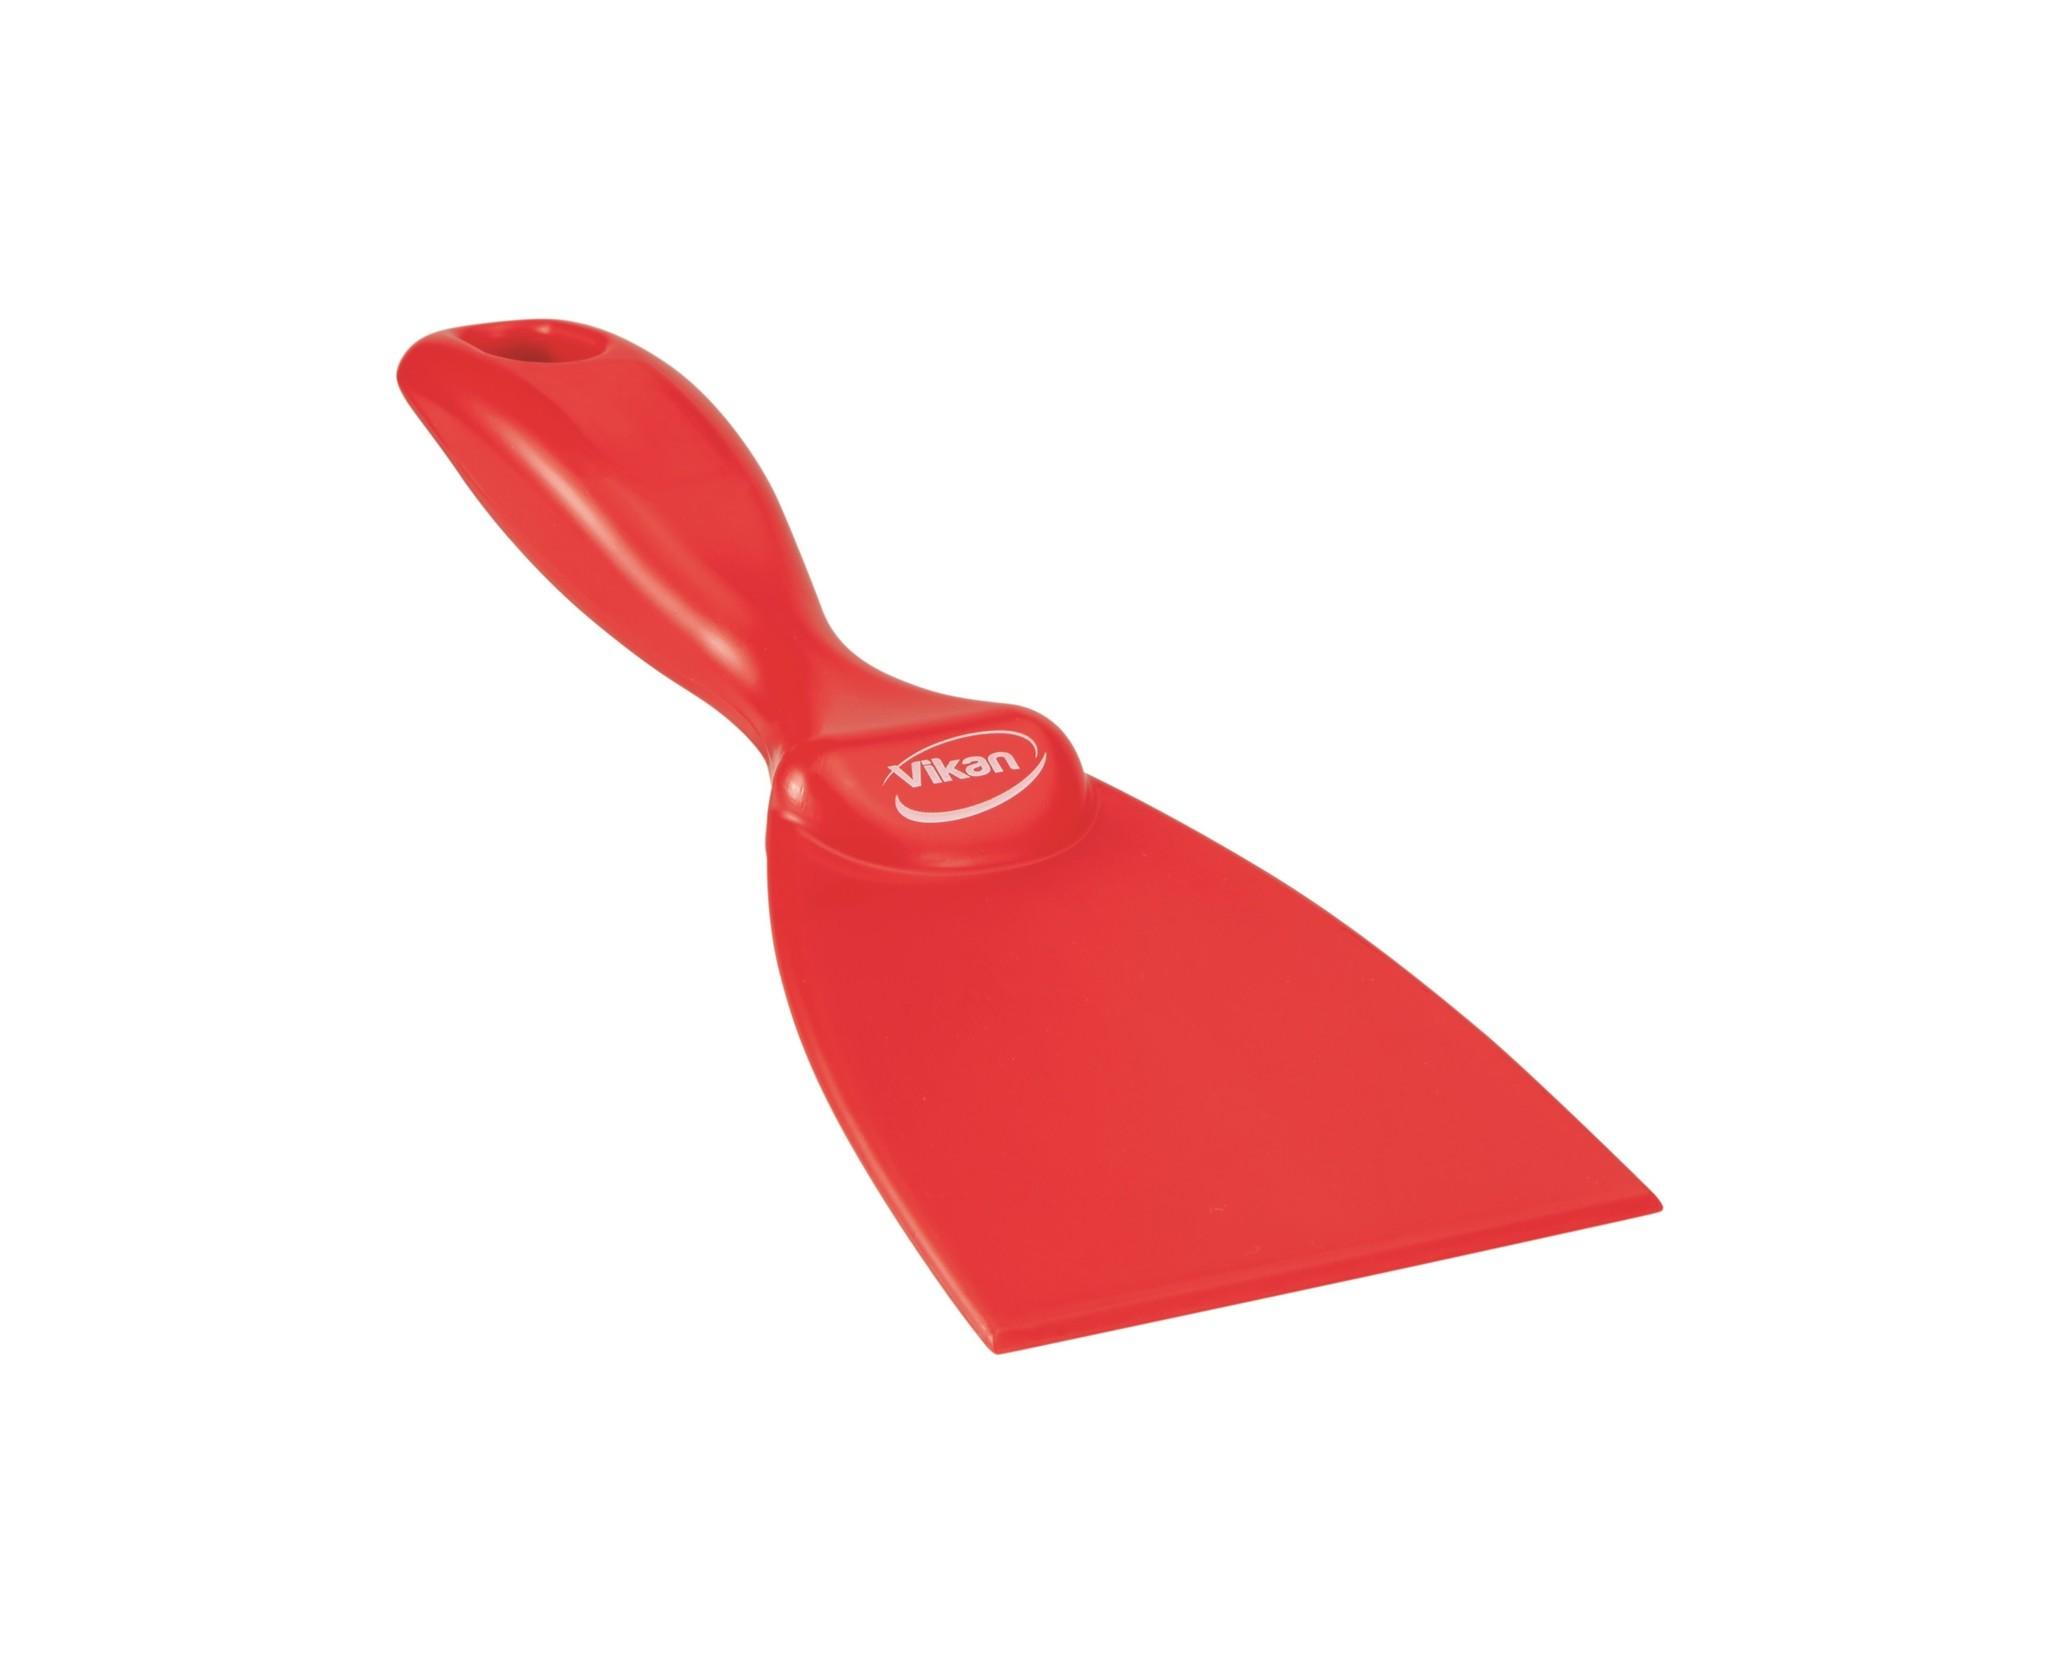 Vikan Handschraper 75 x 210 mm, rood